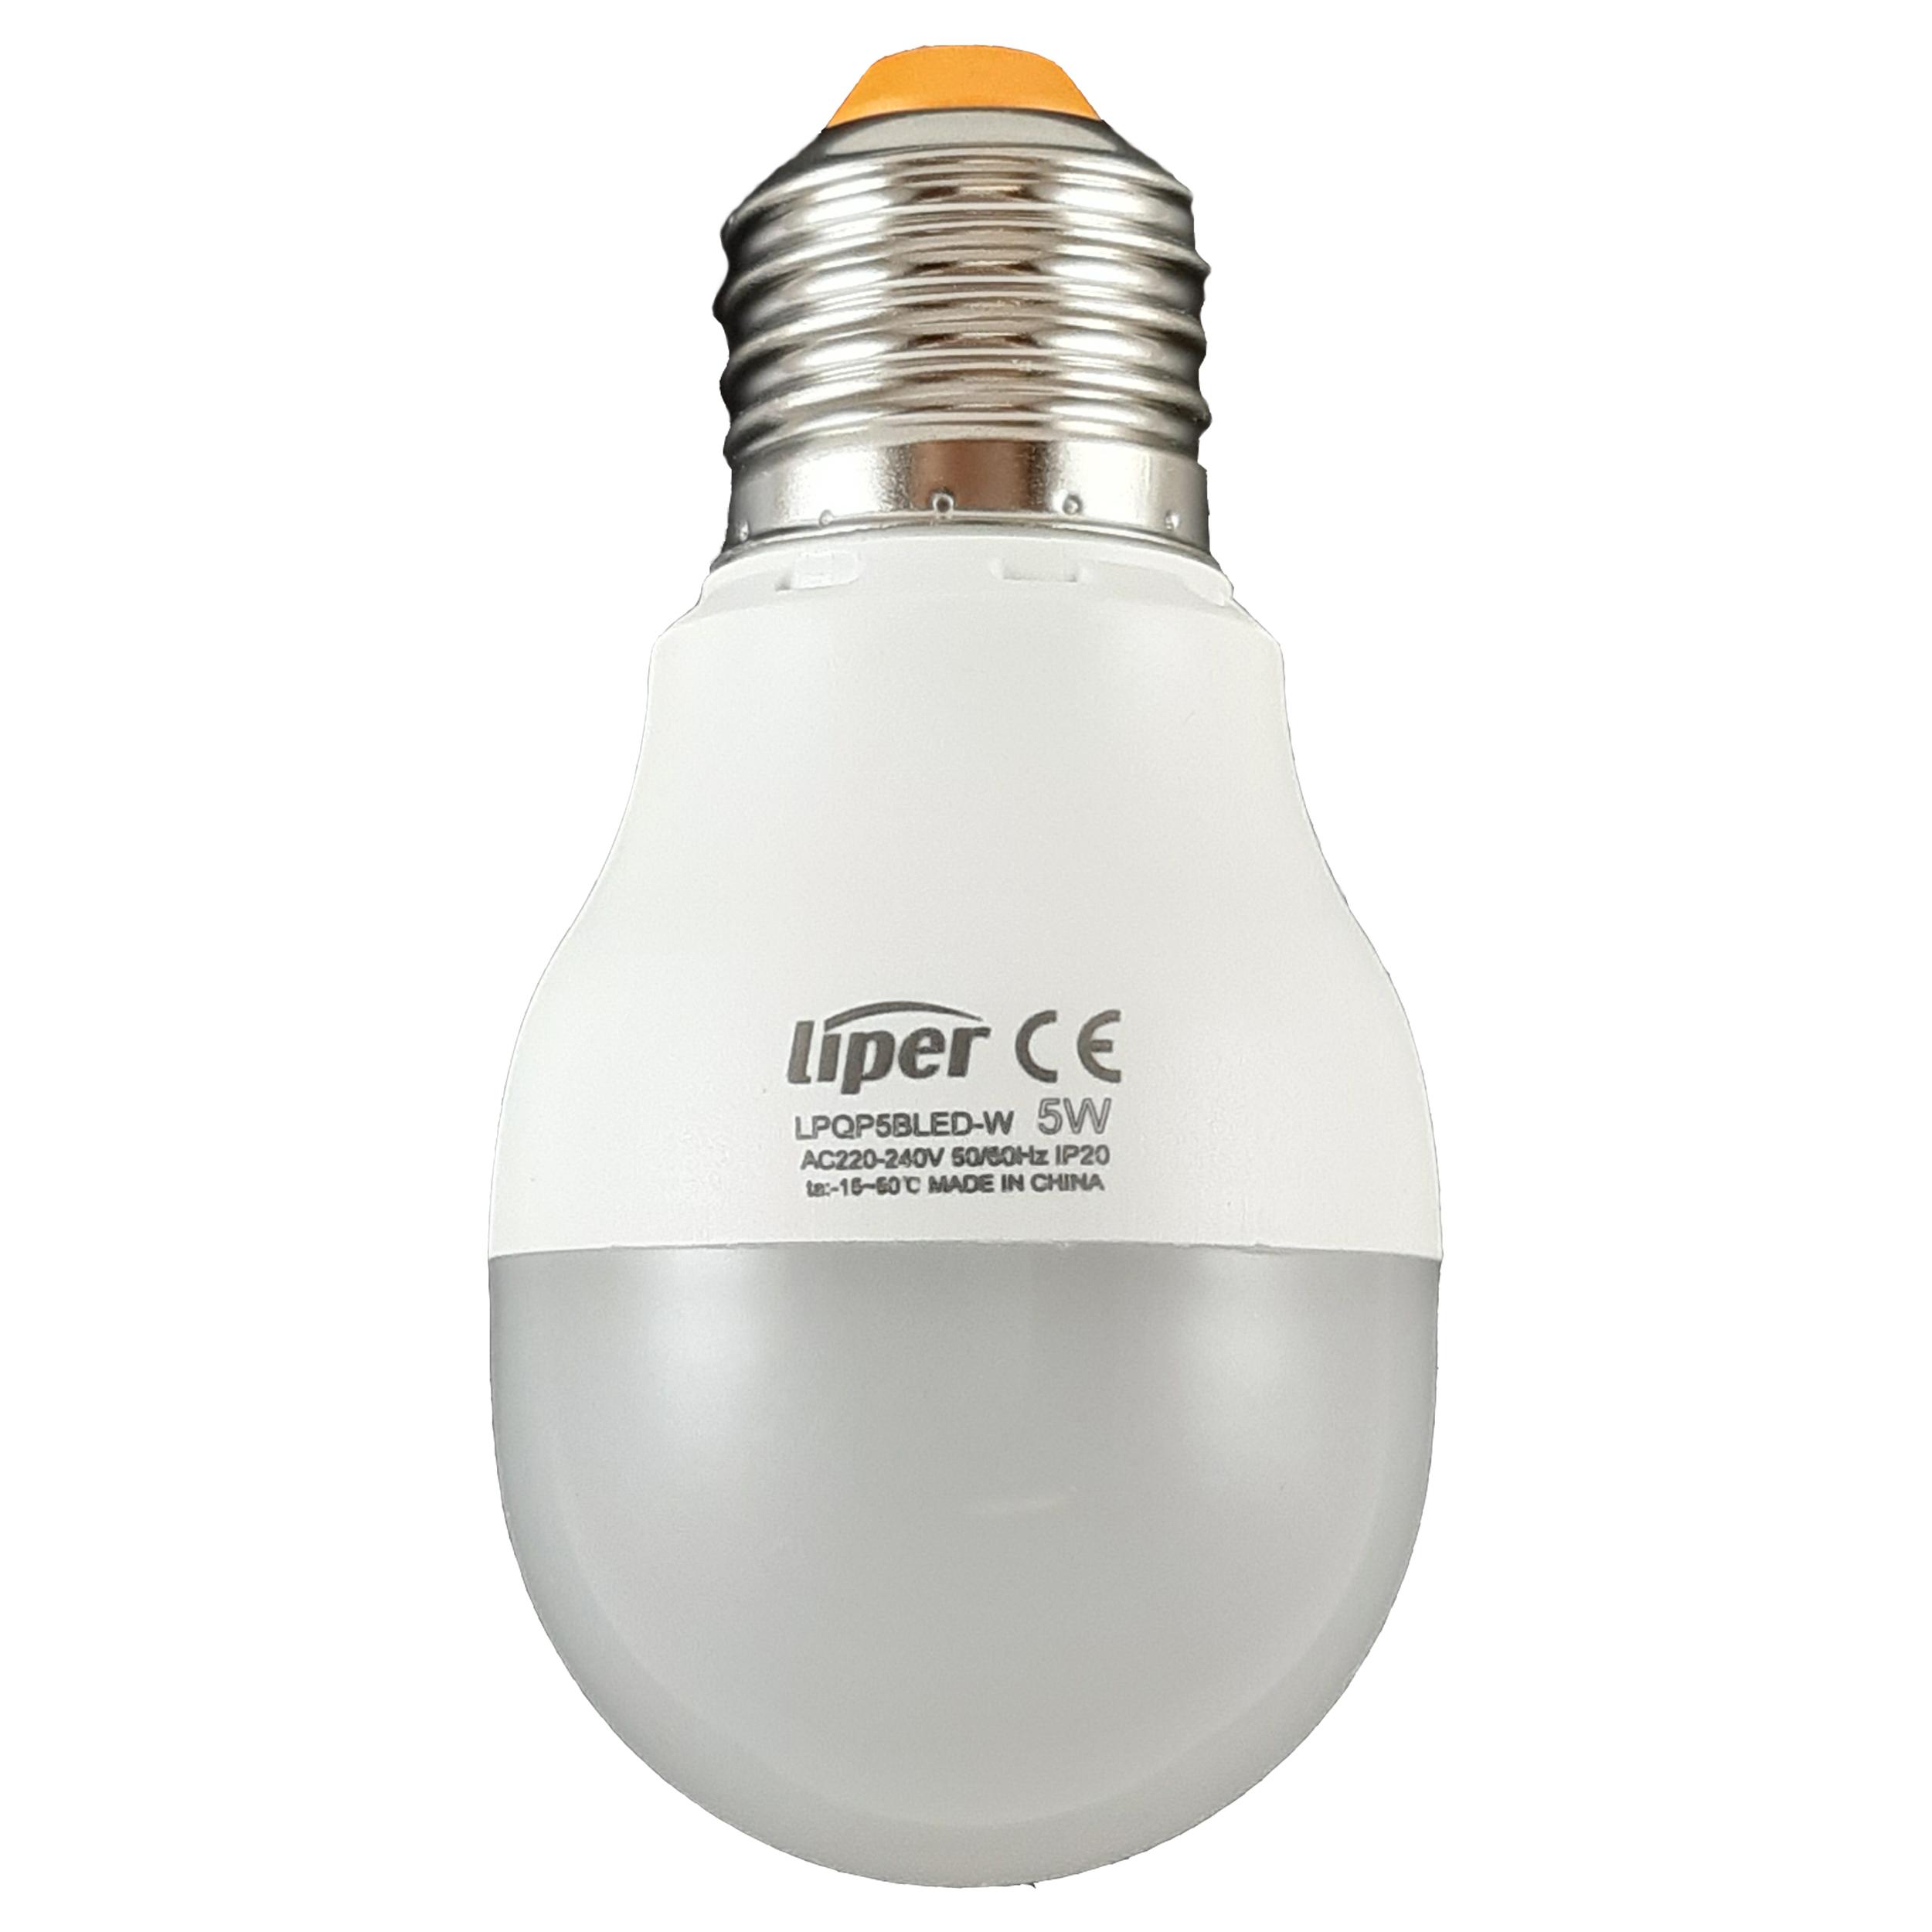 لامپ ال ای دی 5 وات لیپر مدل LPQP5CLED پایه E27